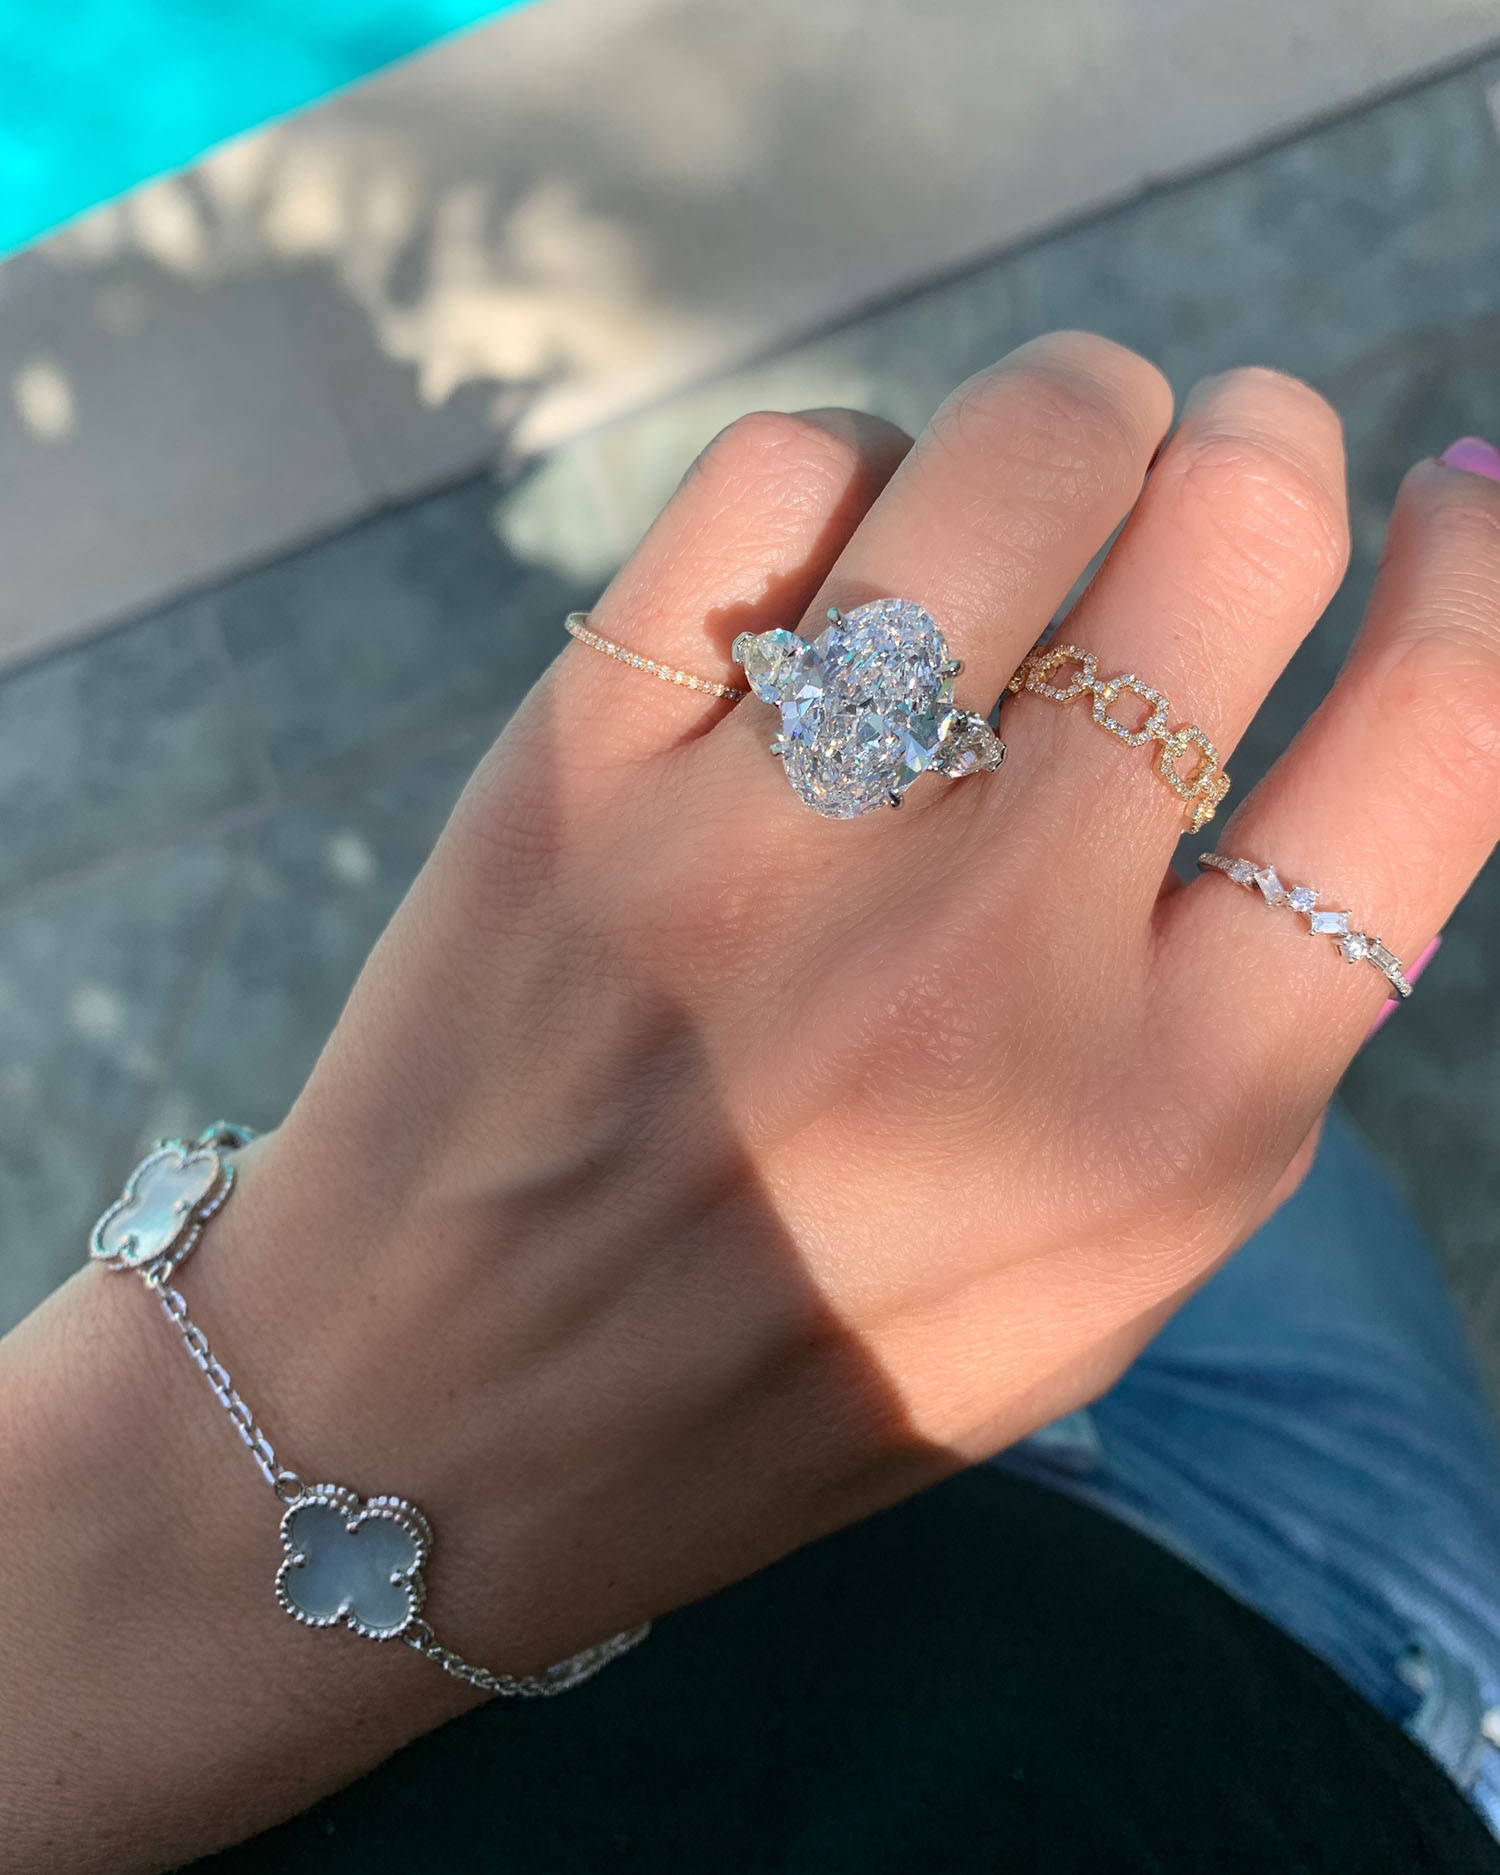 Miss Diamond Ring 7 Carat 8 Carat Oval Diamond Engagement Ring